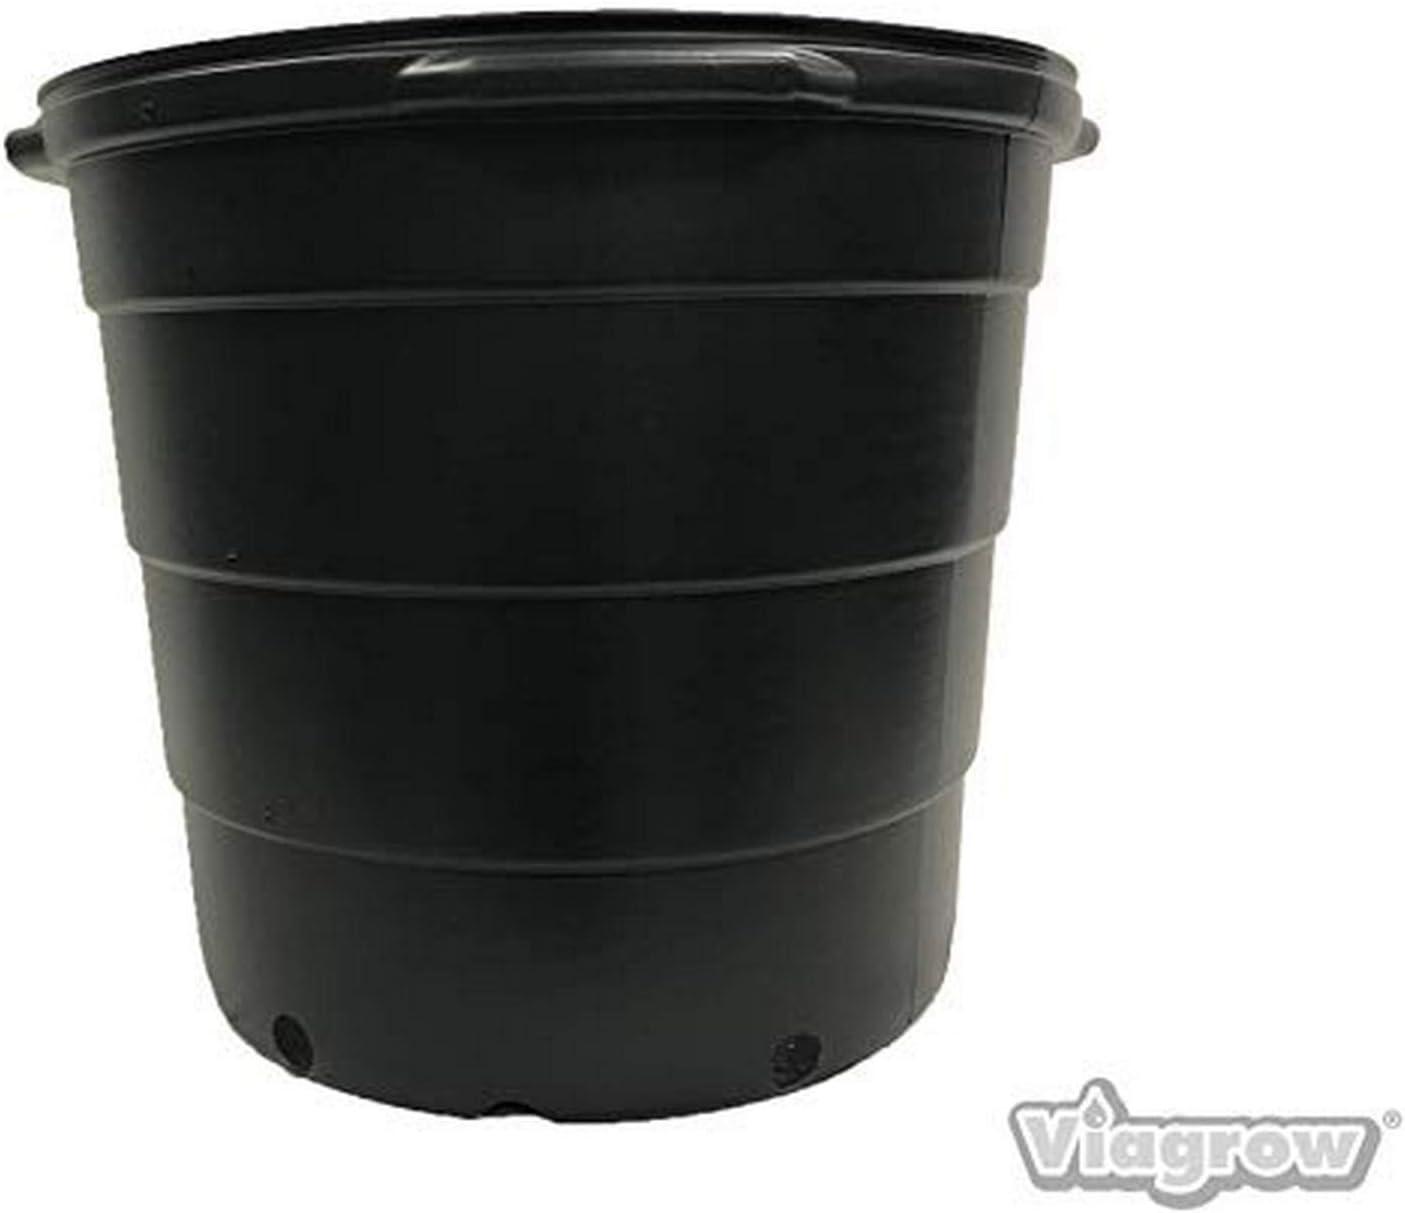 Viagrow VHPP2000-5 20 Gal. Round Plastic Garden (5-Pack) (20.4 Actual gallons / 77.22 liters/3.17 CU ft) Nursery POTS, BLACK